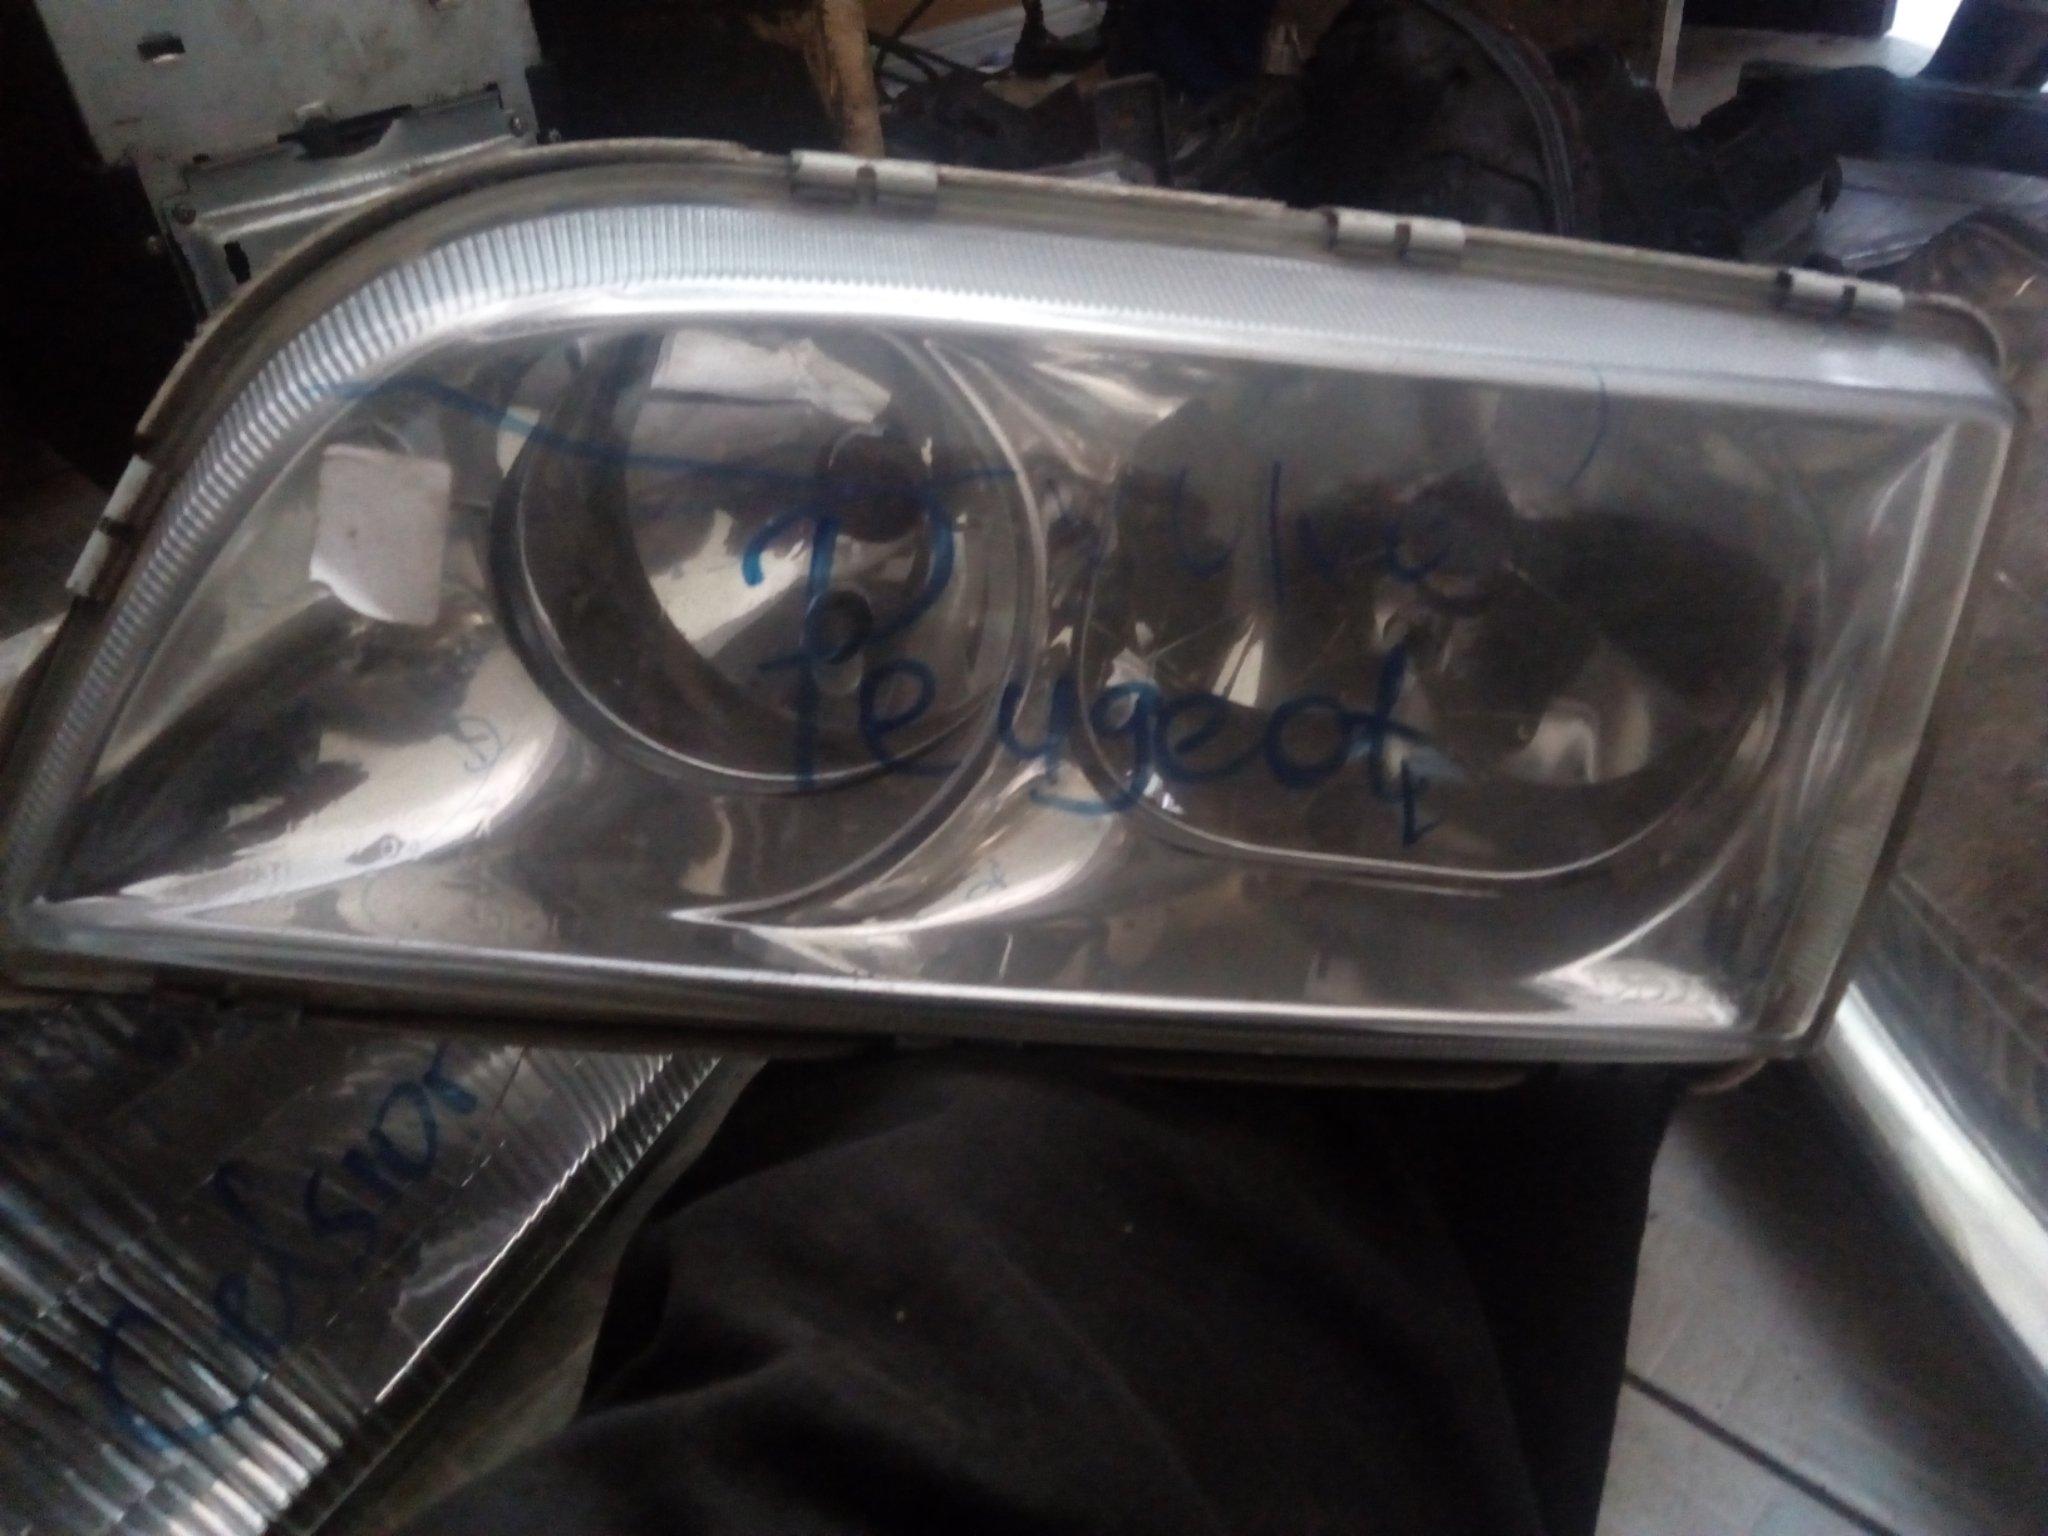 Peugeot headlight 00571